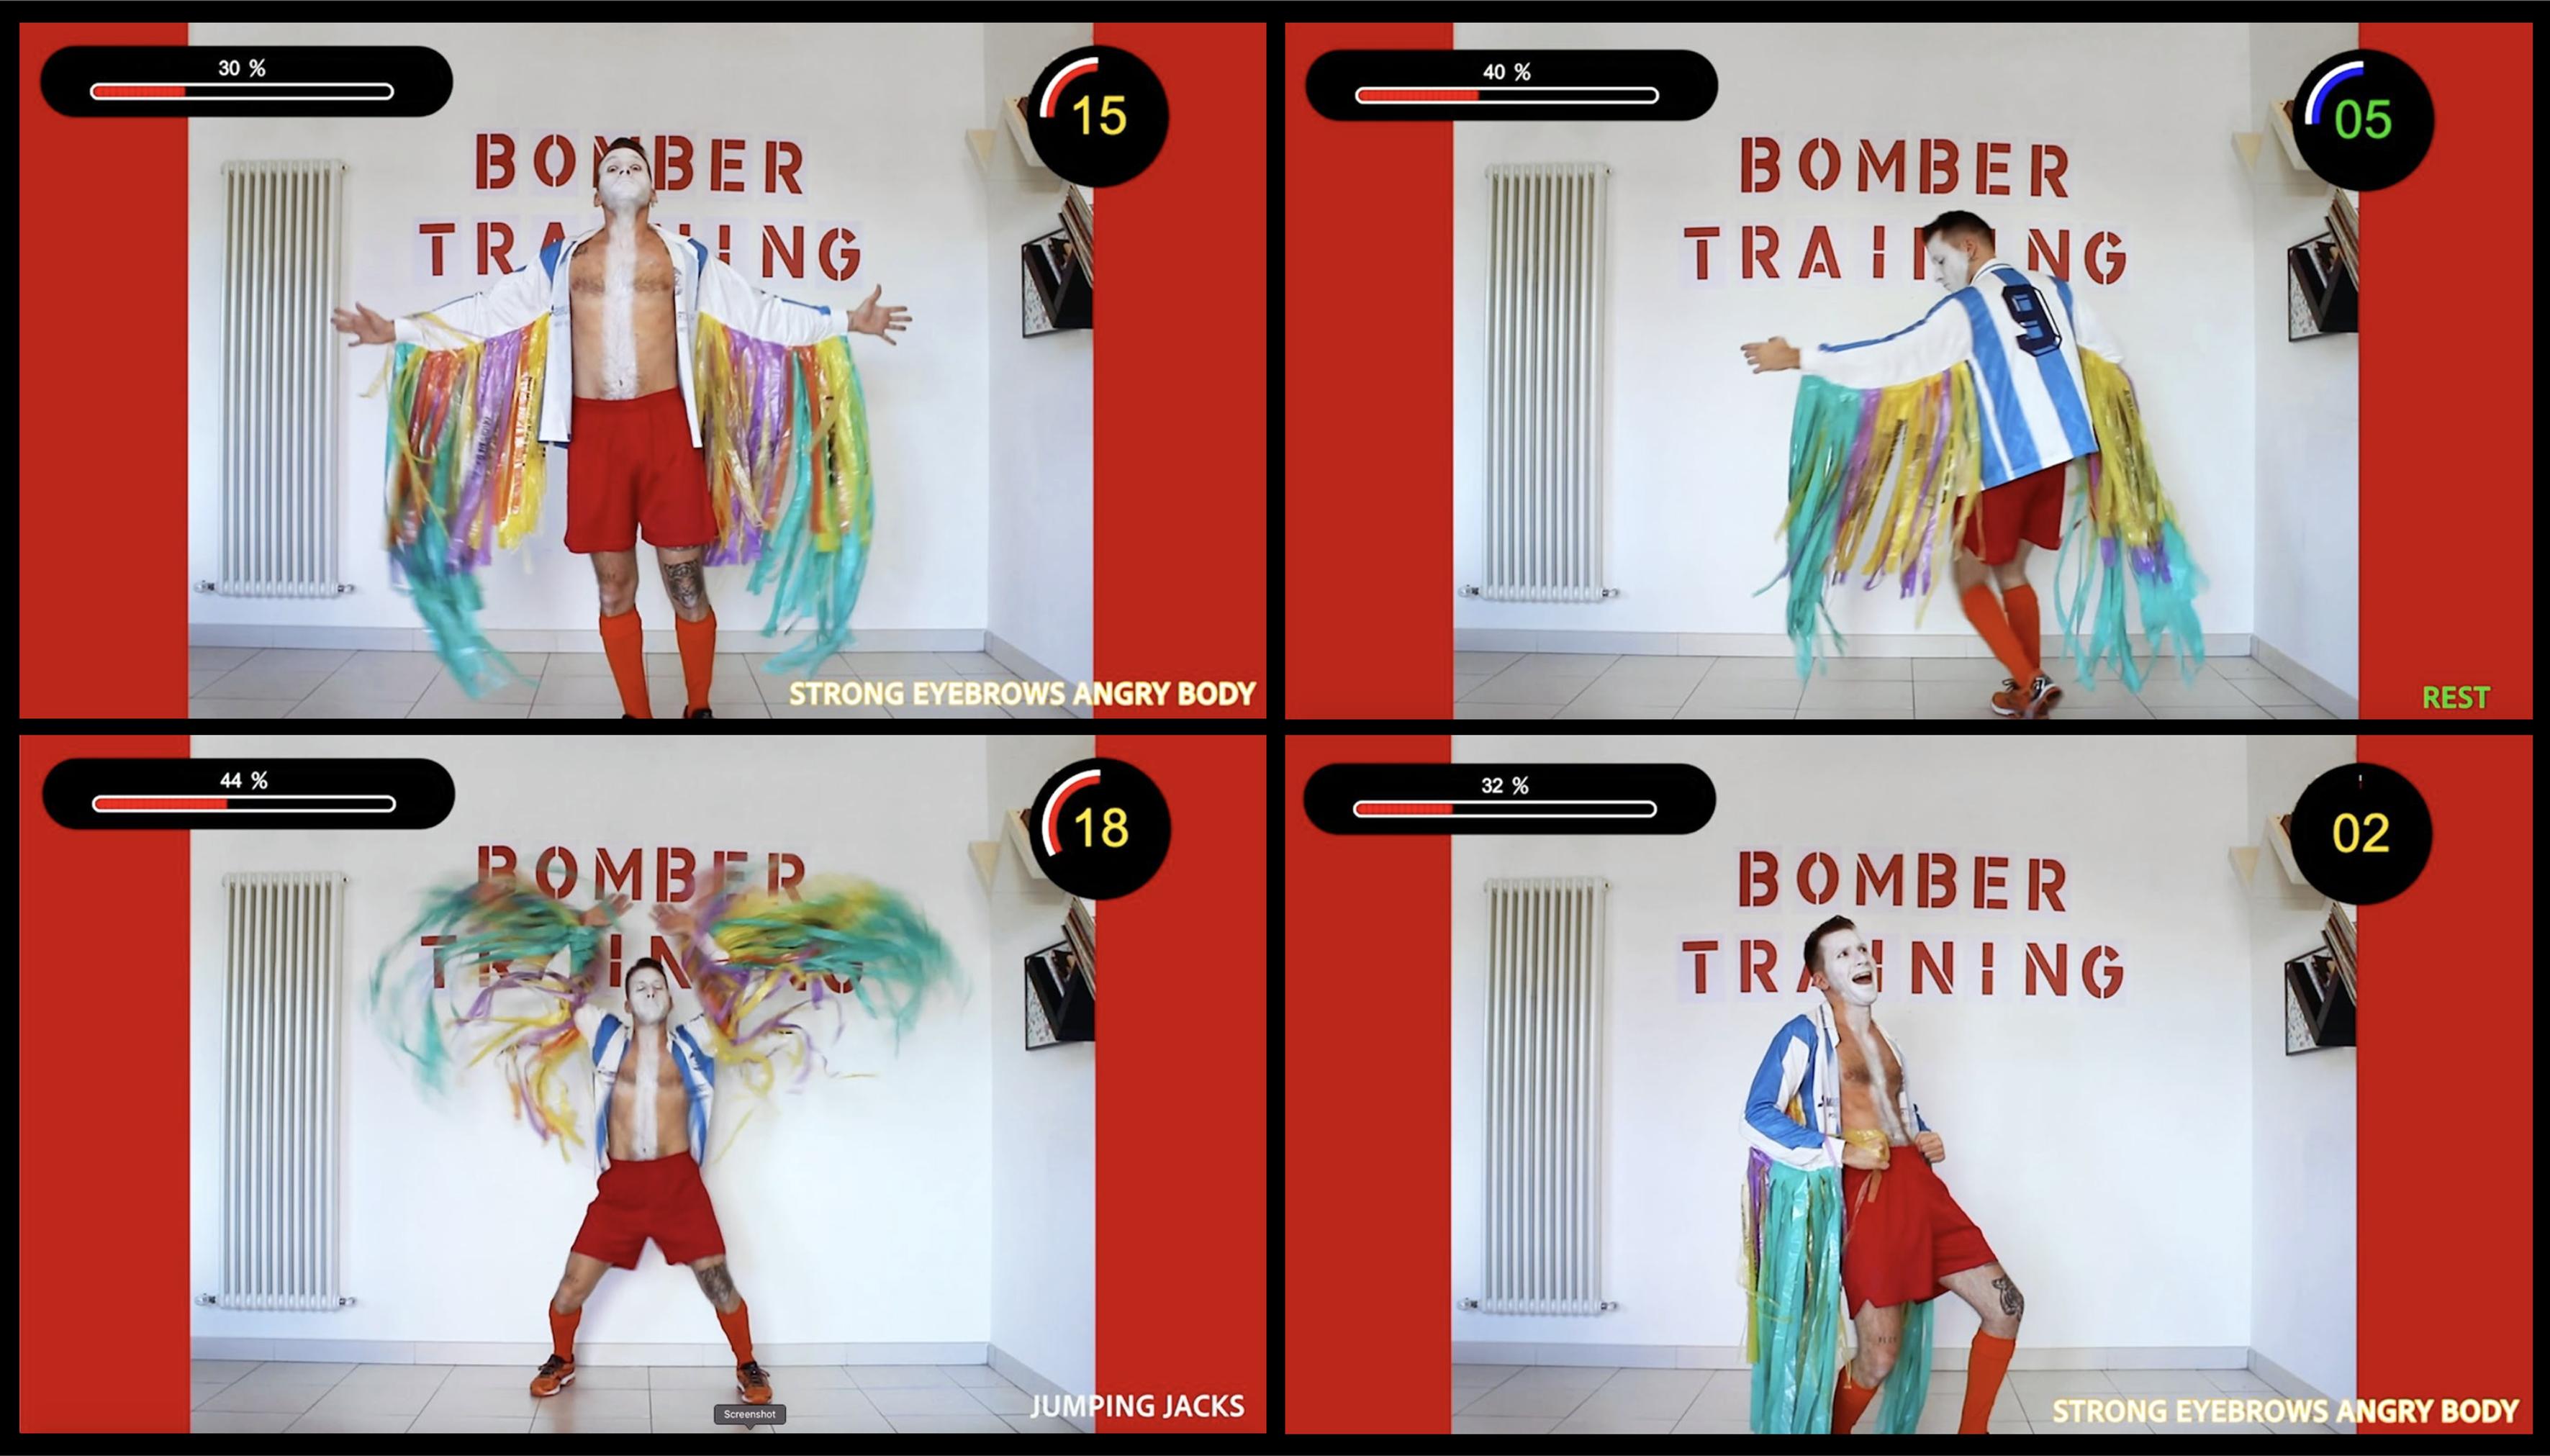 BOMBER TRAINING_2020_Luca Bosani_00